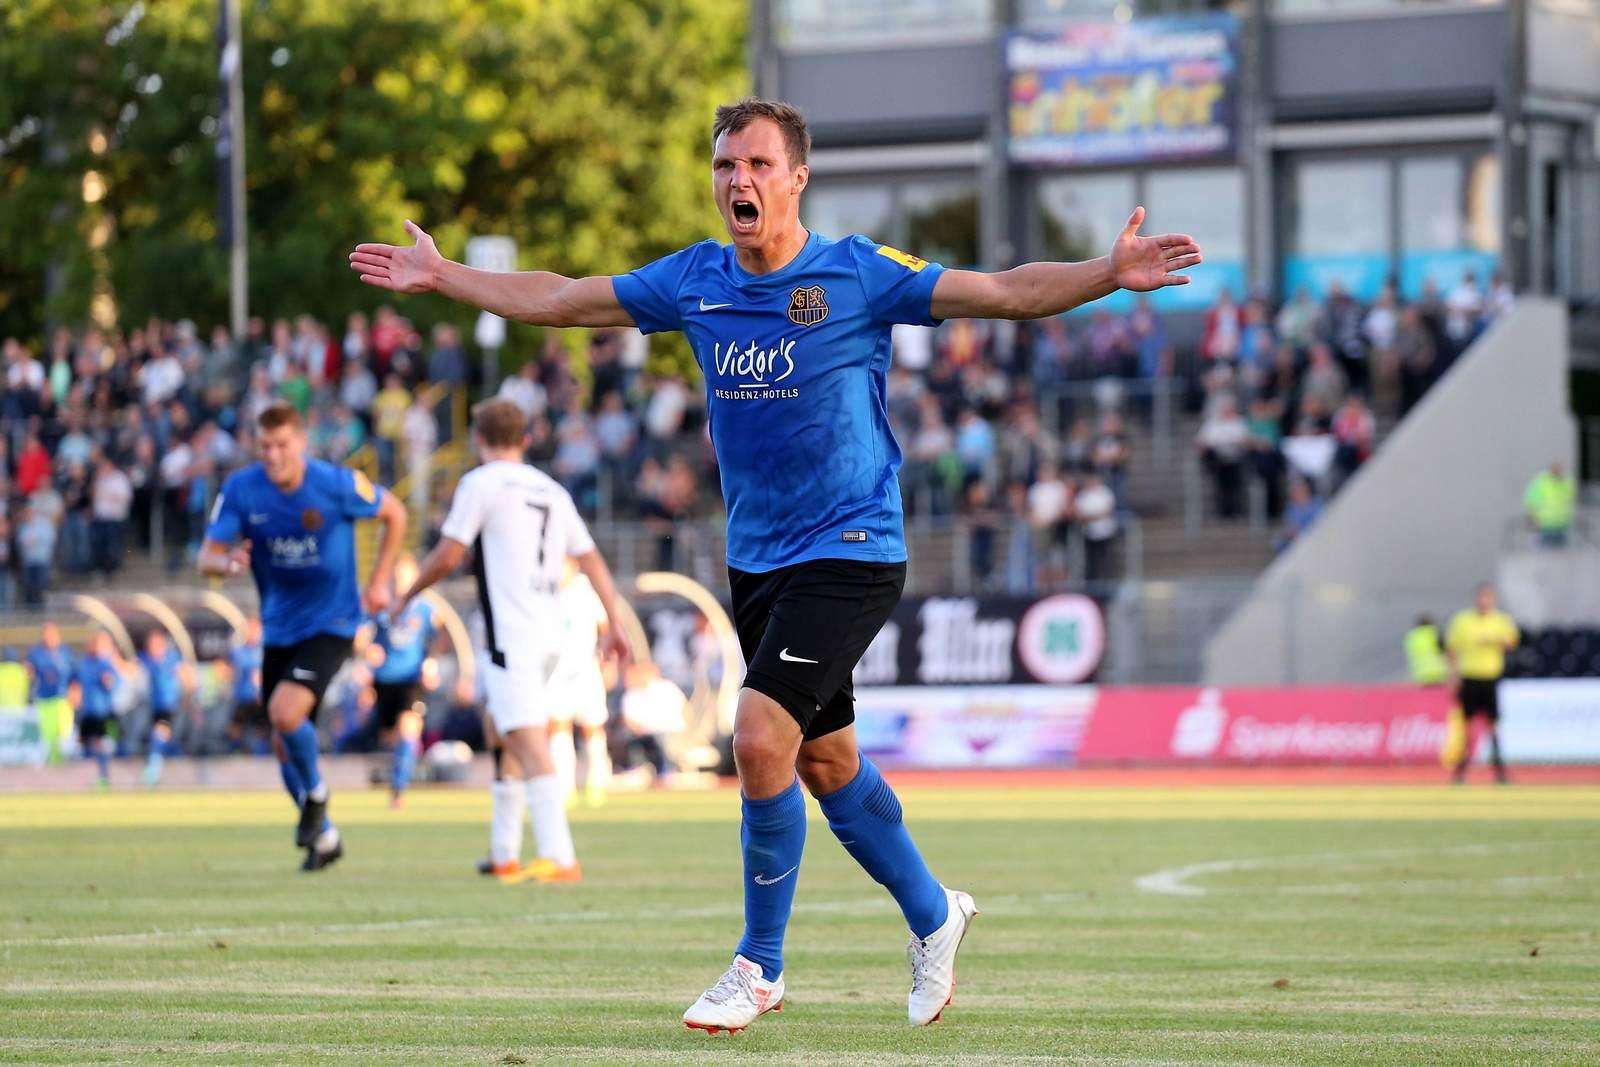 Tobias Jänicke jubelt für den 1. FC Saarbrücken. Bei Liga-Drei.de dankt er rückblickend den Fans des FC Hansa Rostock